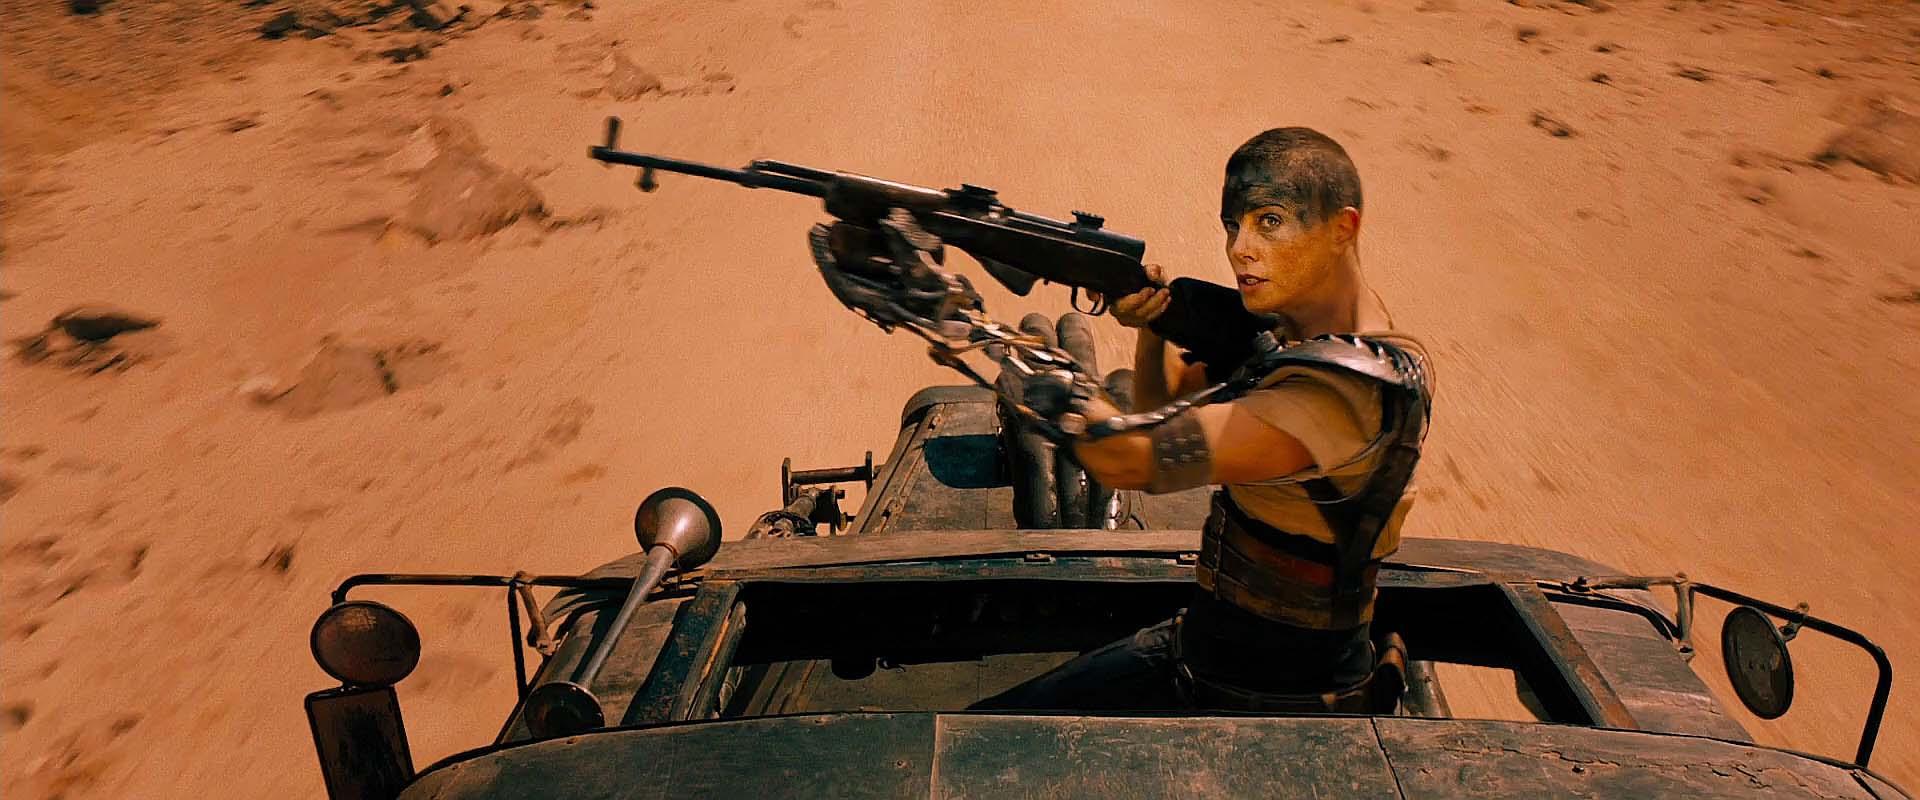 SKS Type 56 Mad Max Fury Road